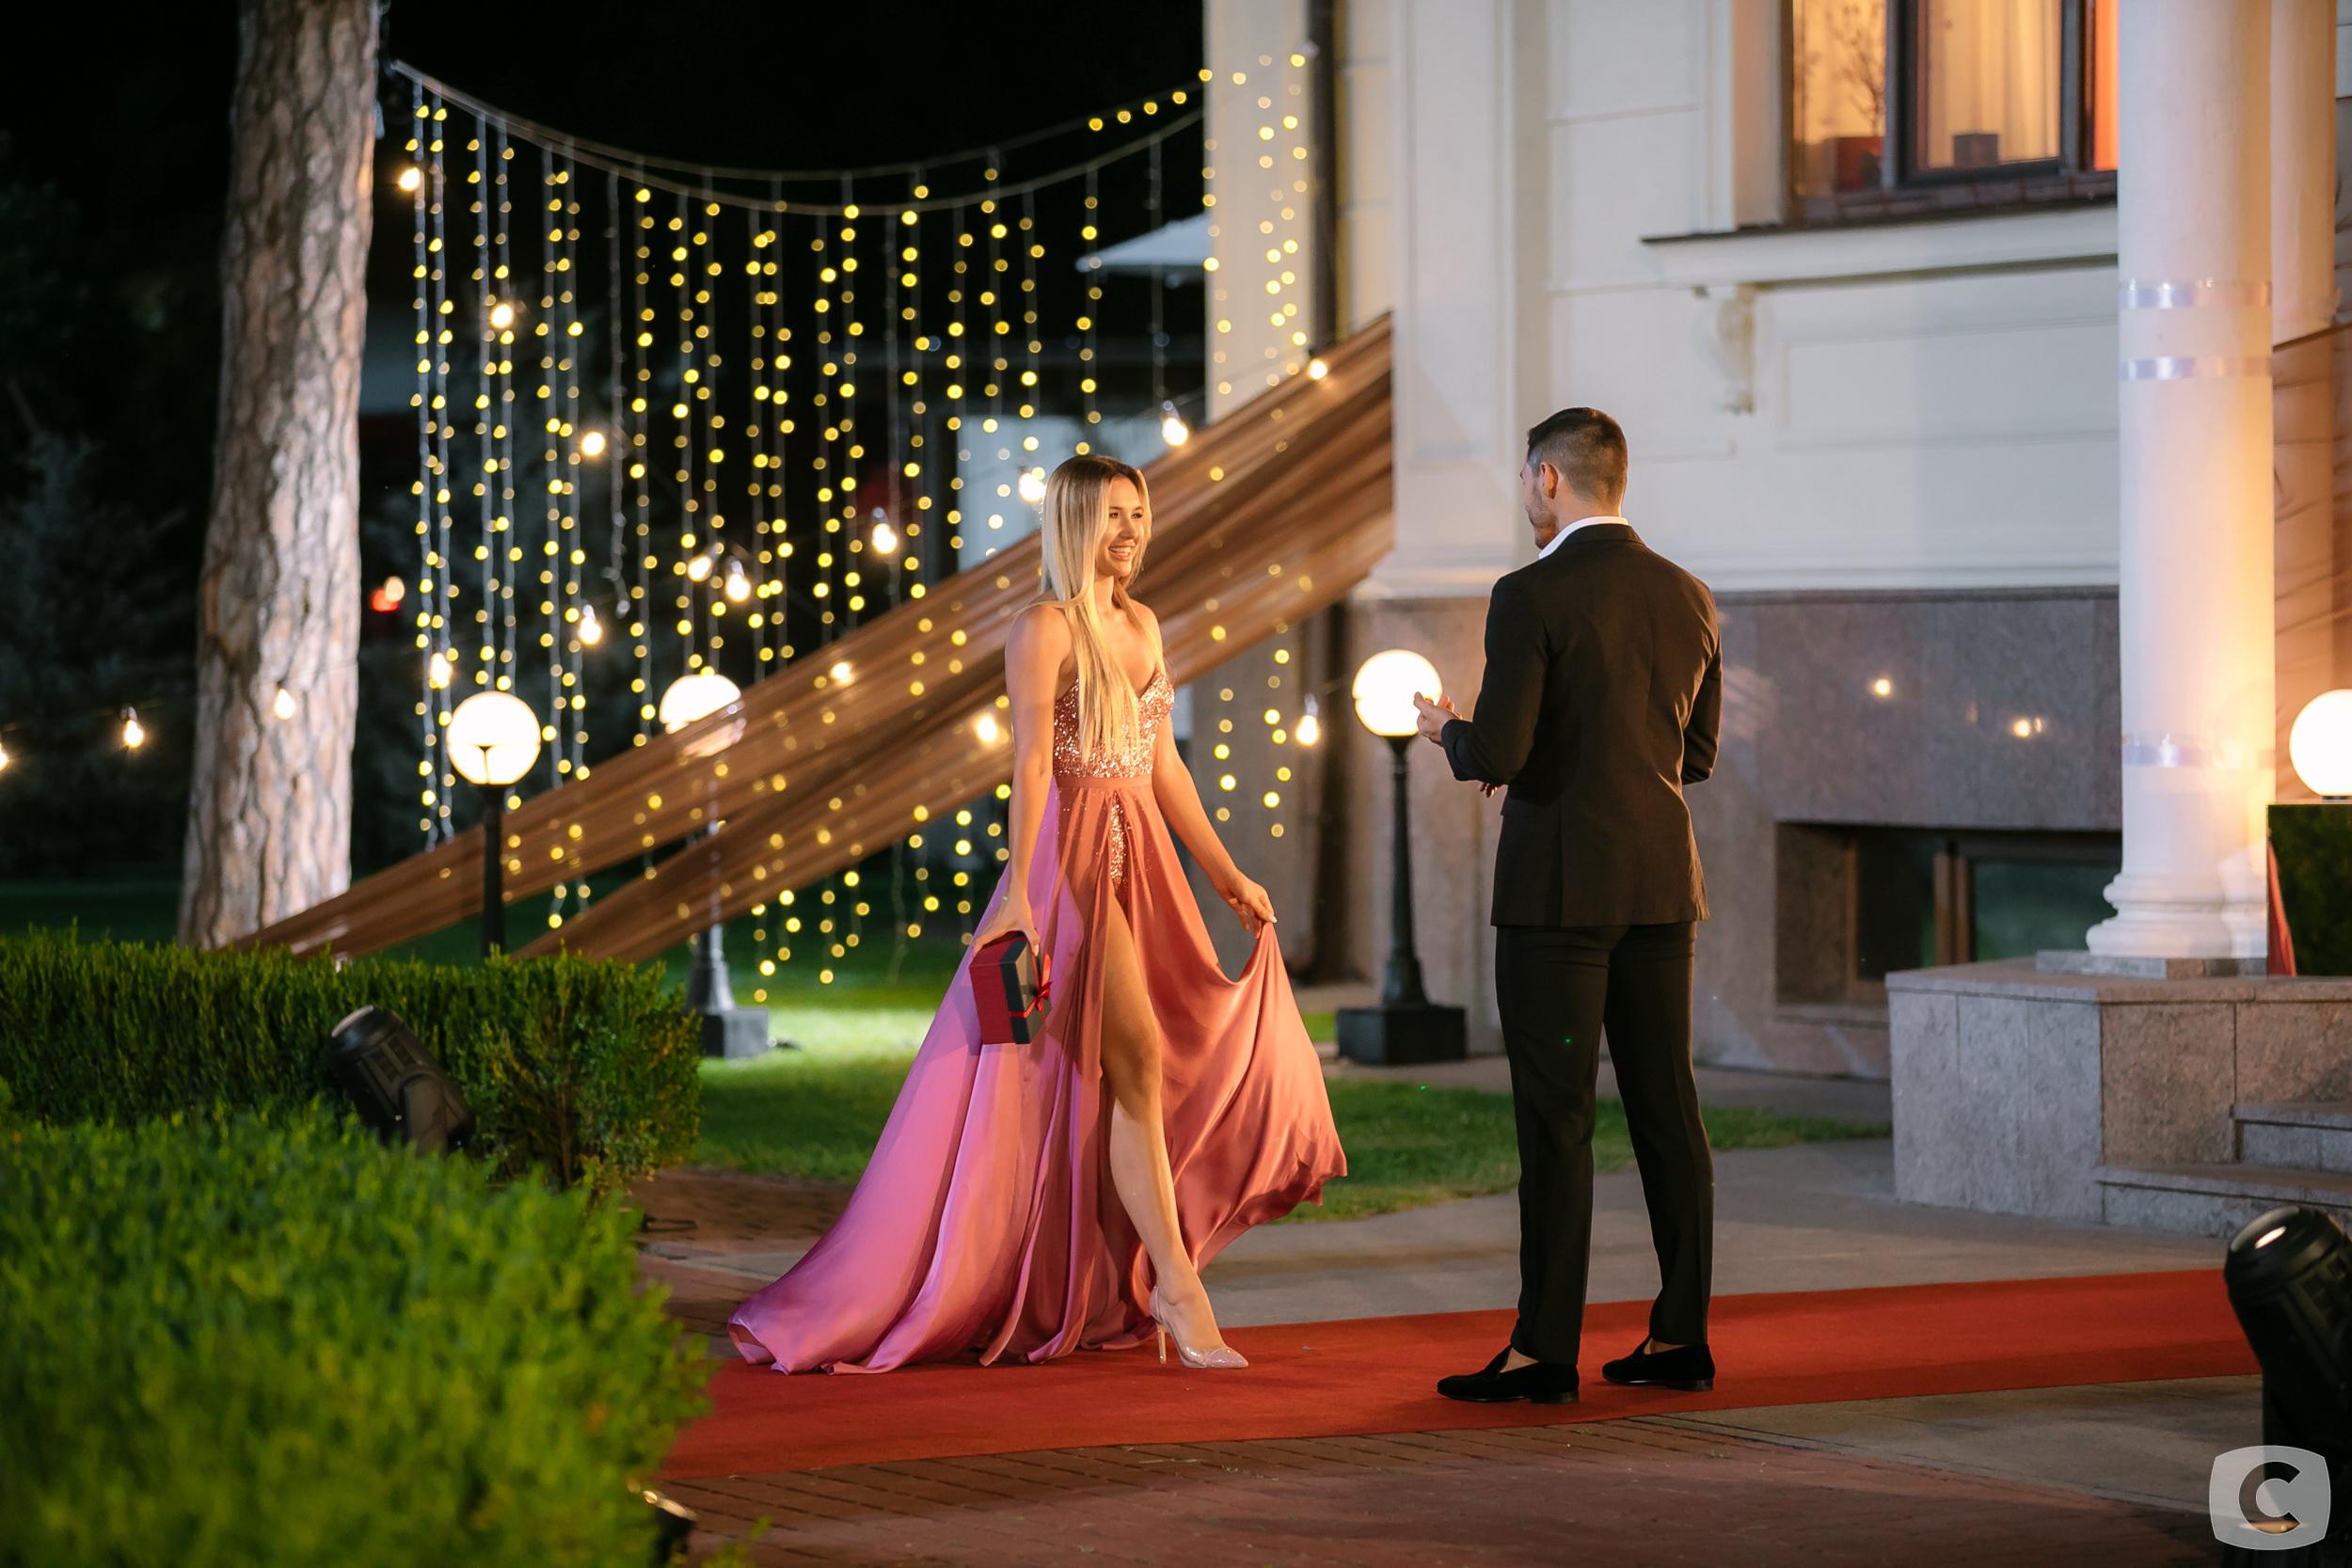 Bachelor Ukraine - Season 9 - Nikita Dobrynin - *Sleuthing Spoilers* - Page 6 5c814089dc582